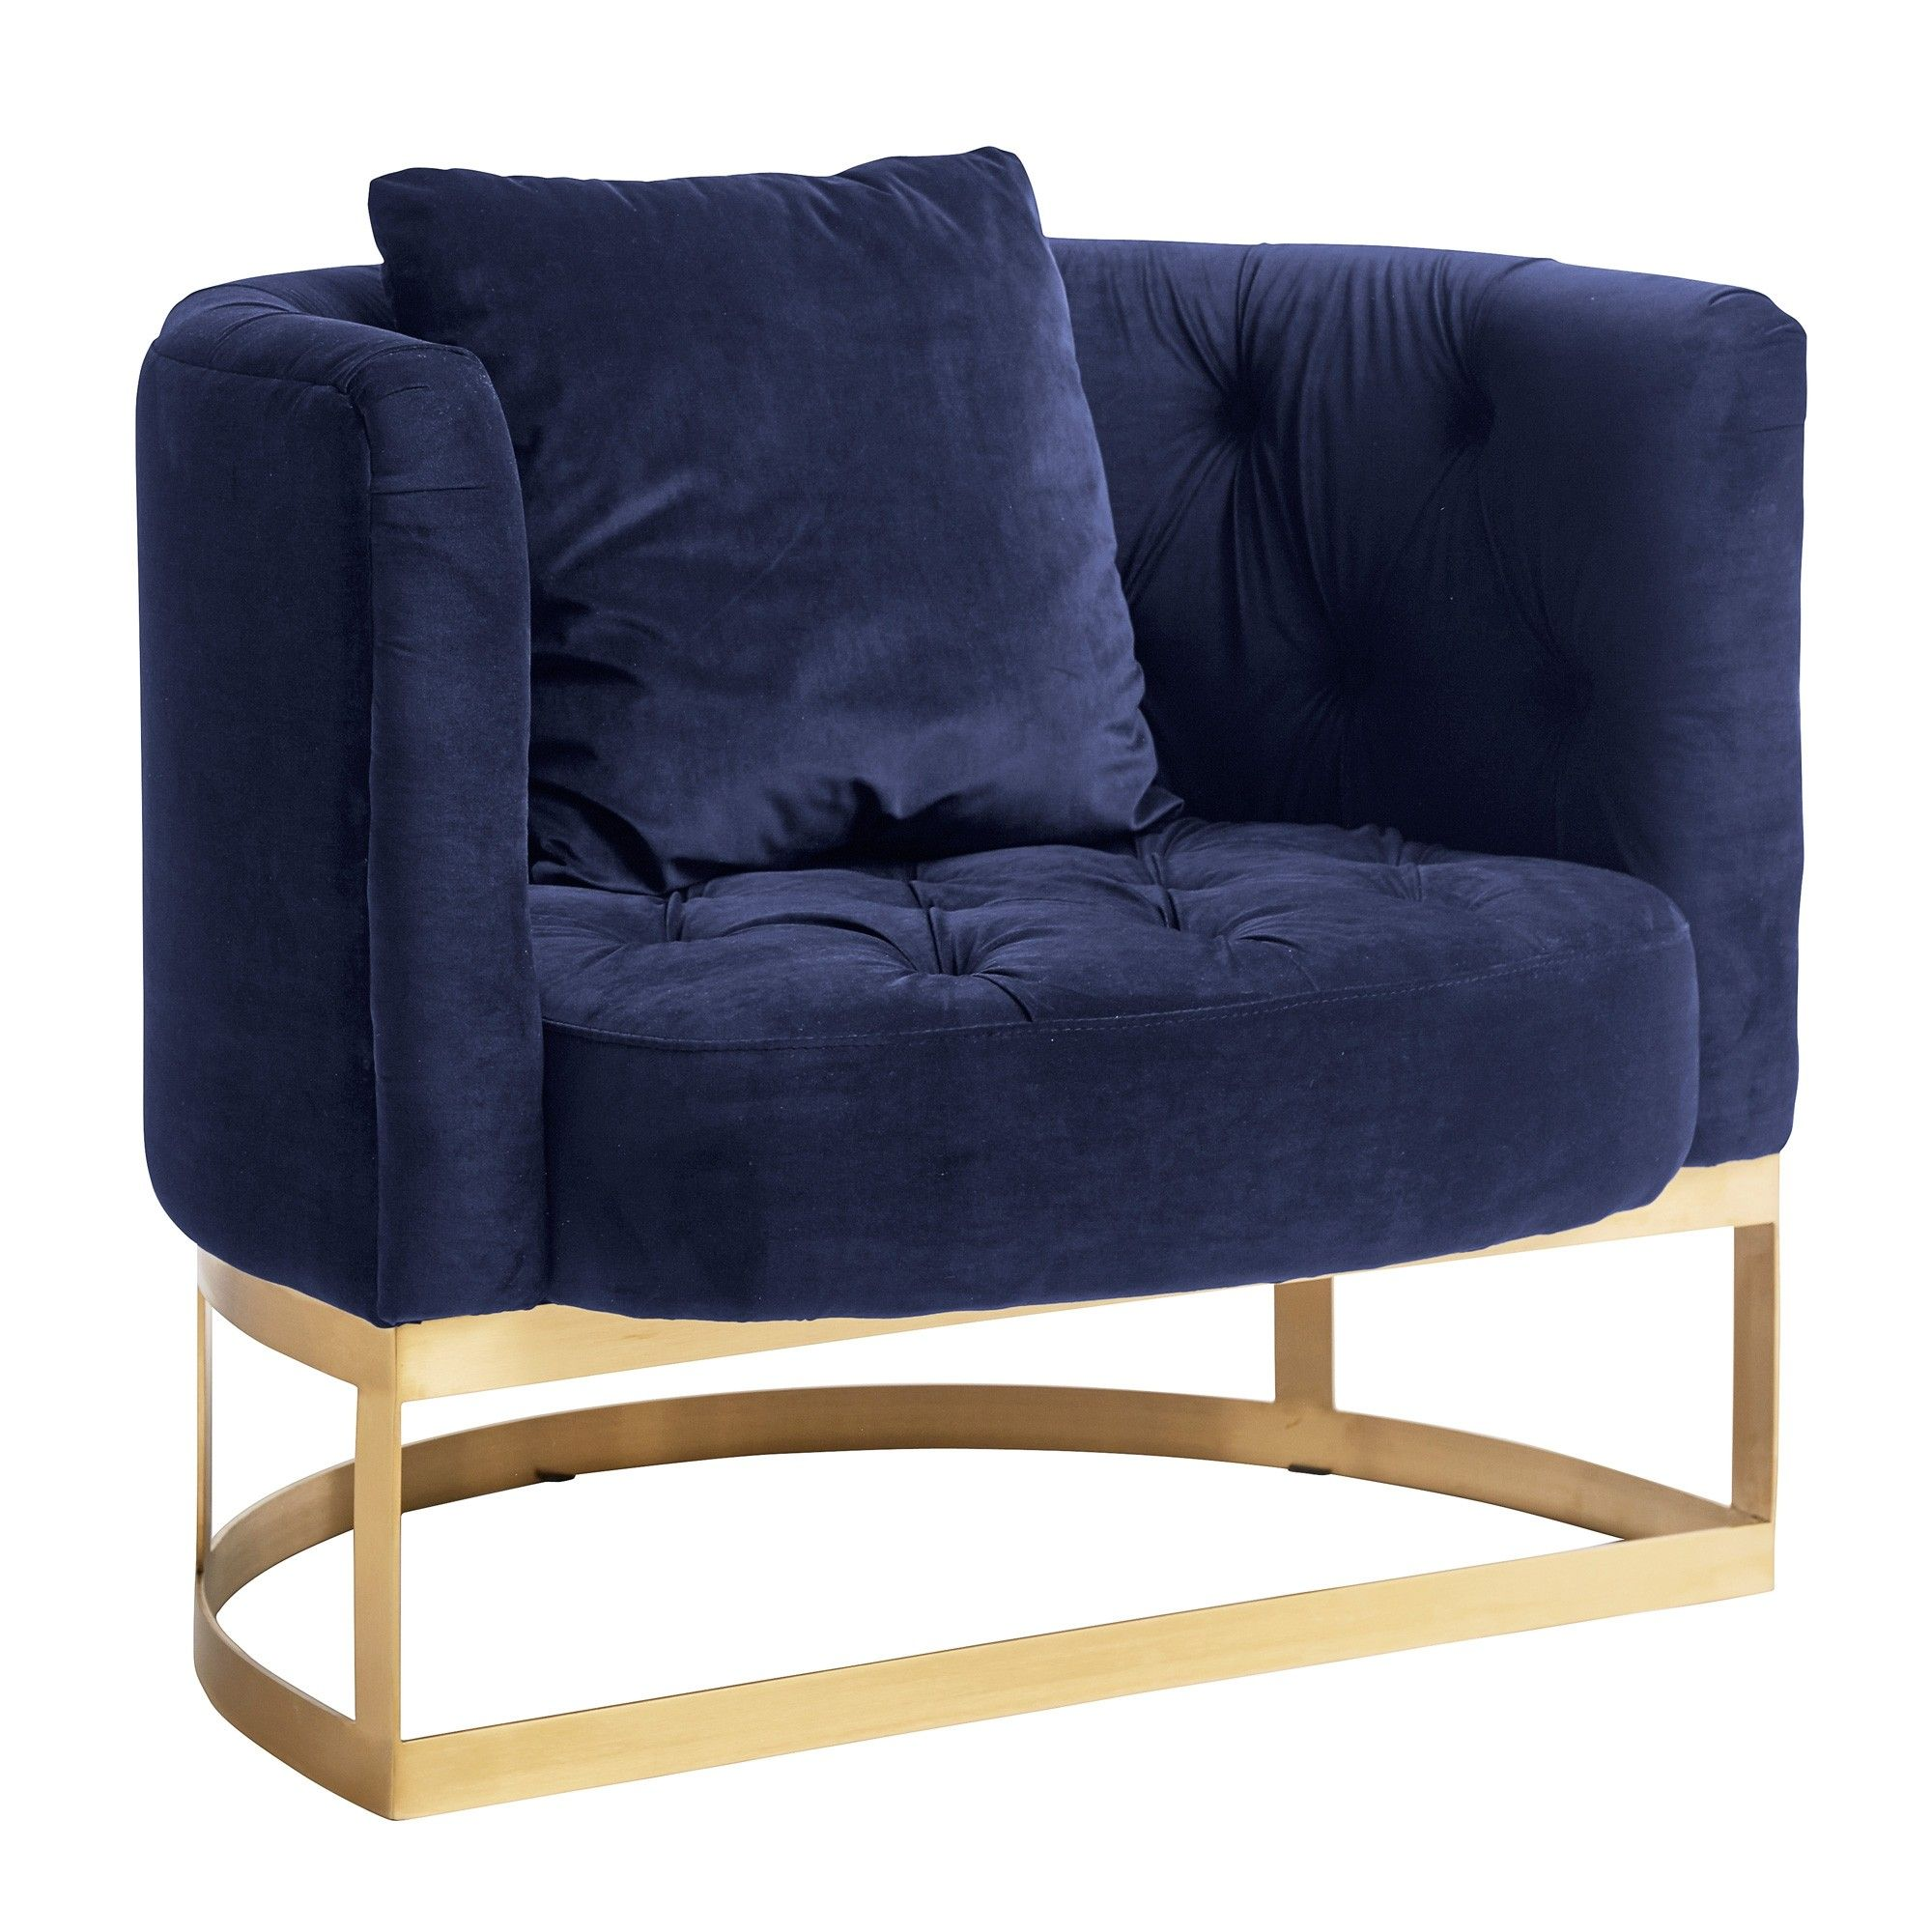 Half Circle Chair Folding Library Plans Armchair In Blue Stephenson Street Pinterest